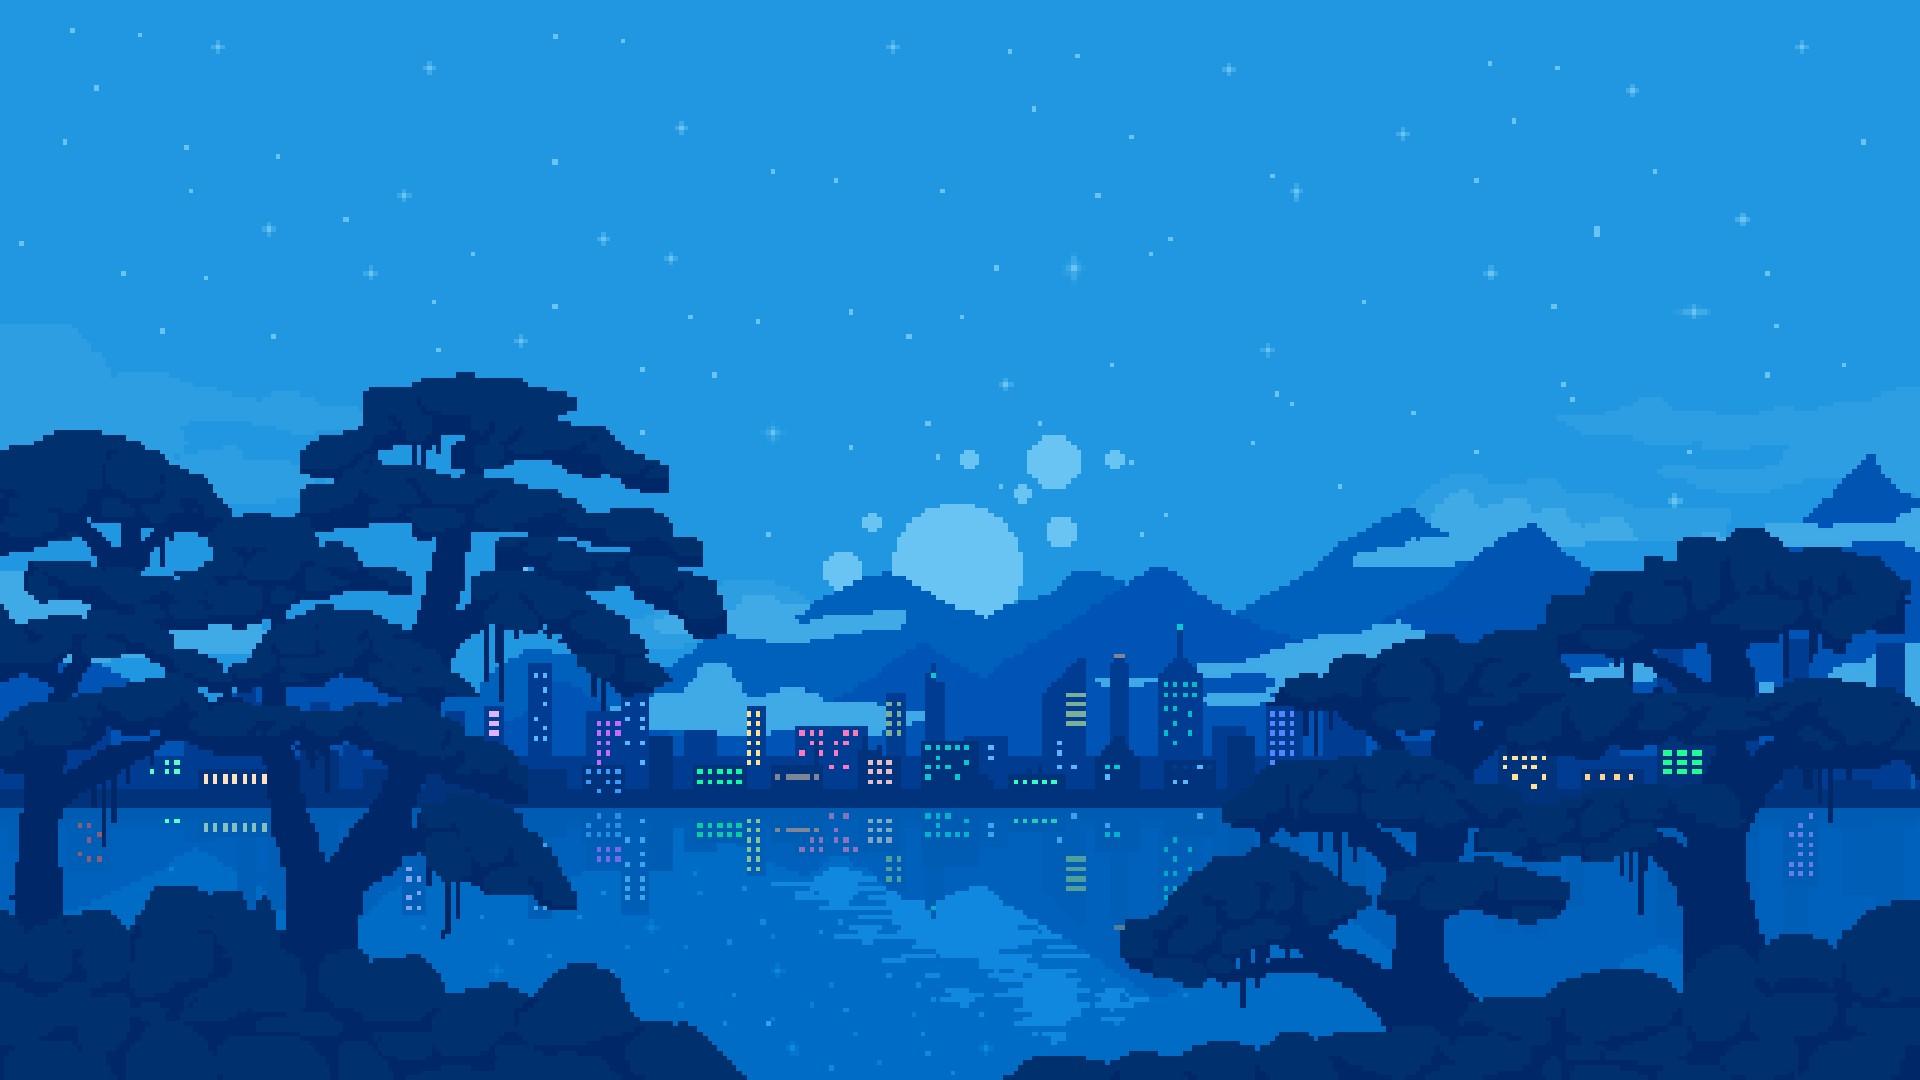 pixel landscape background tumblr 183�� download free full hd